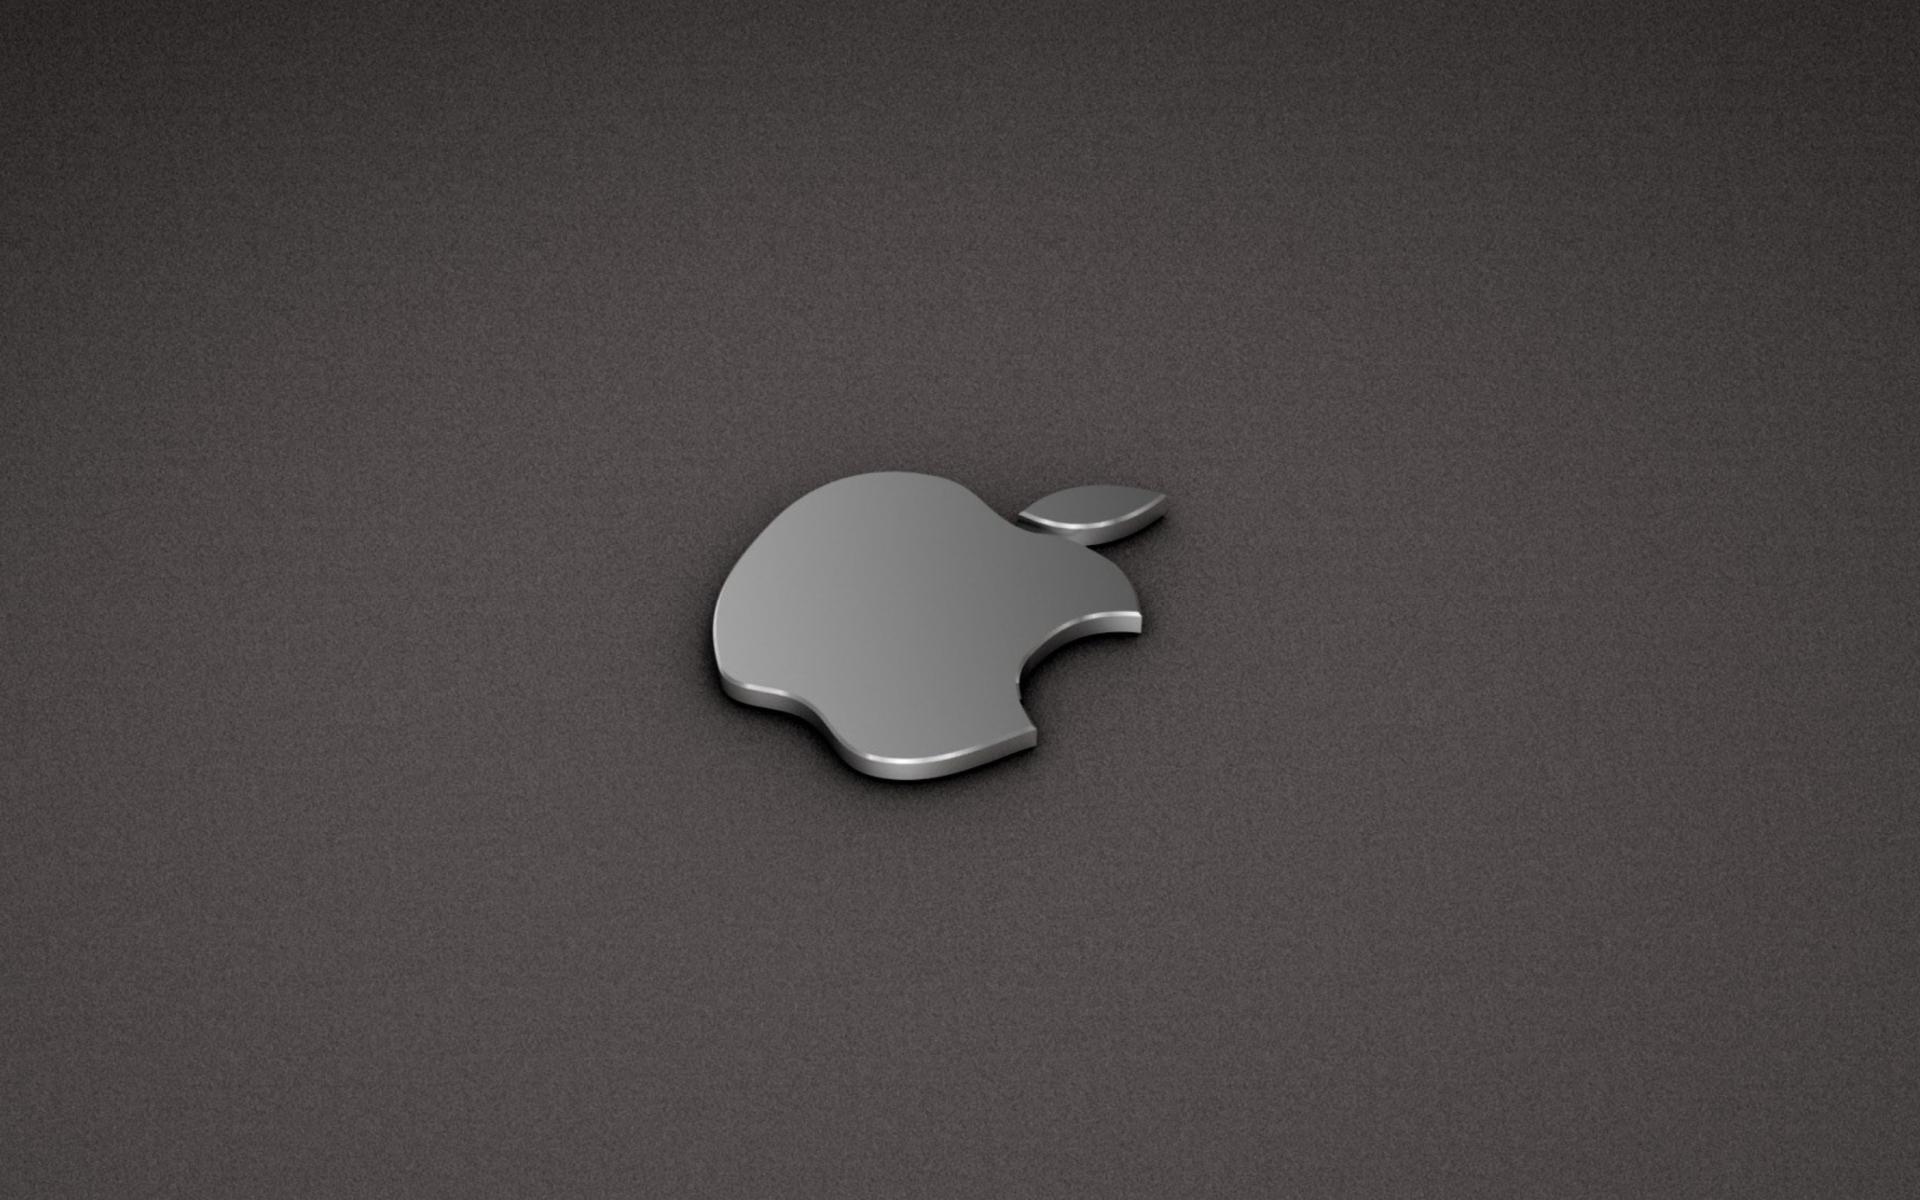 apple logo metallic wallpaper for 1920x1200图片